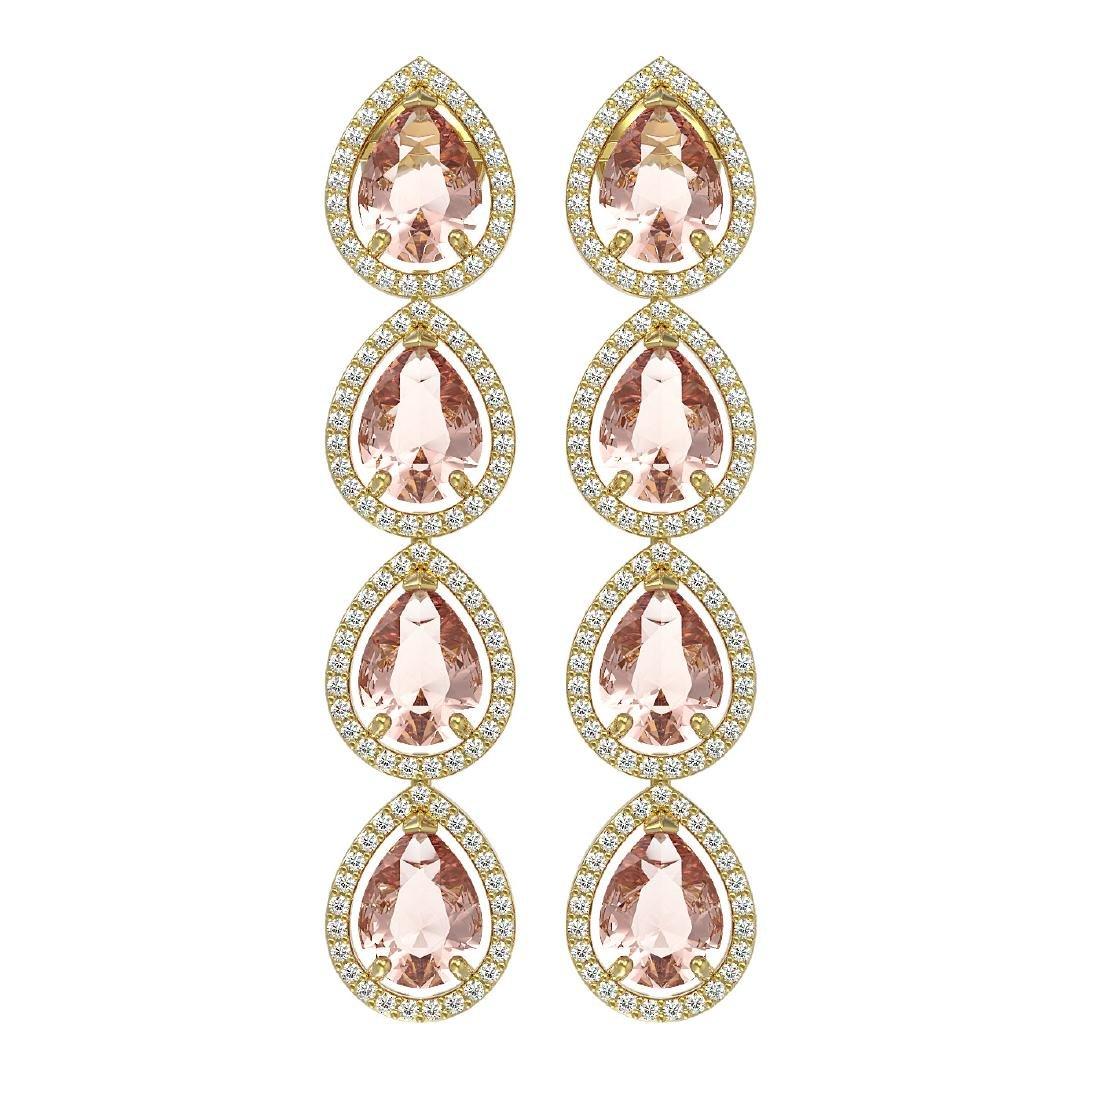 10.4 CTW Morganite & Diamond Halo Earrings 10K Yellow